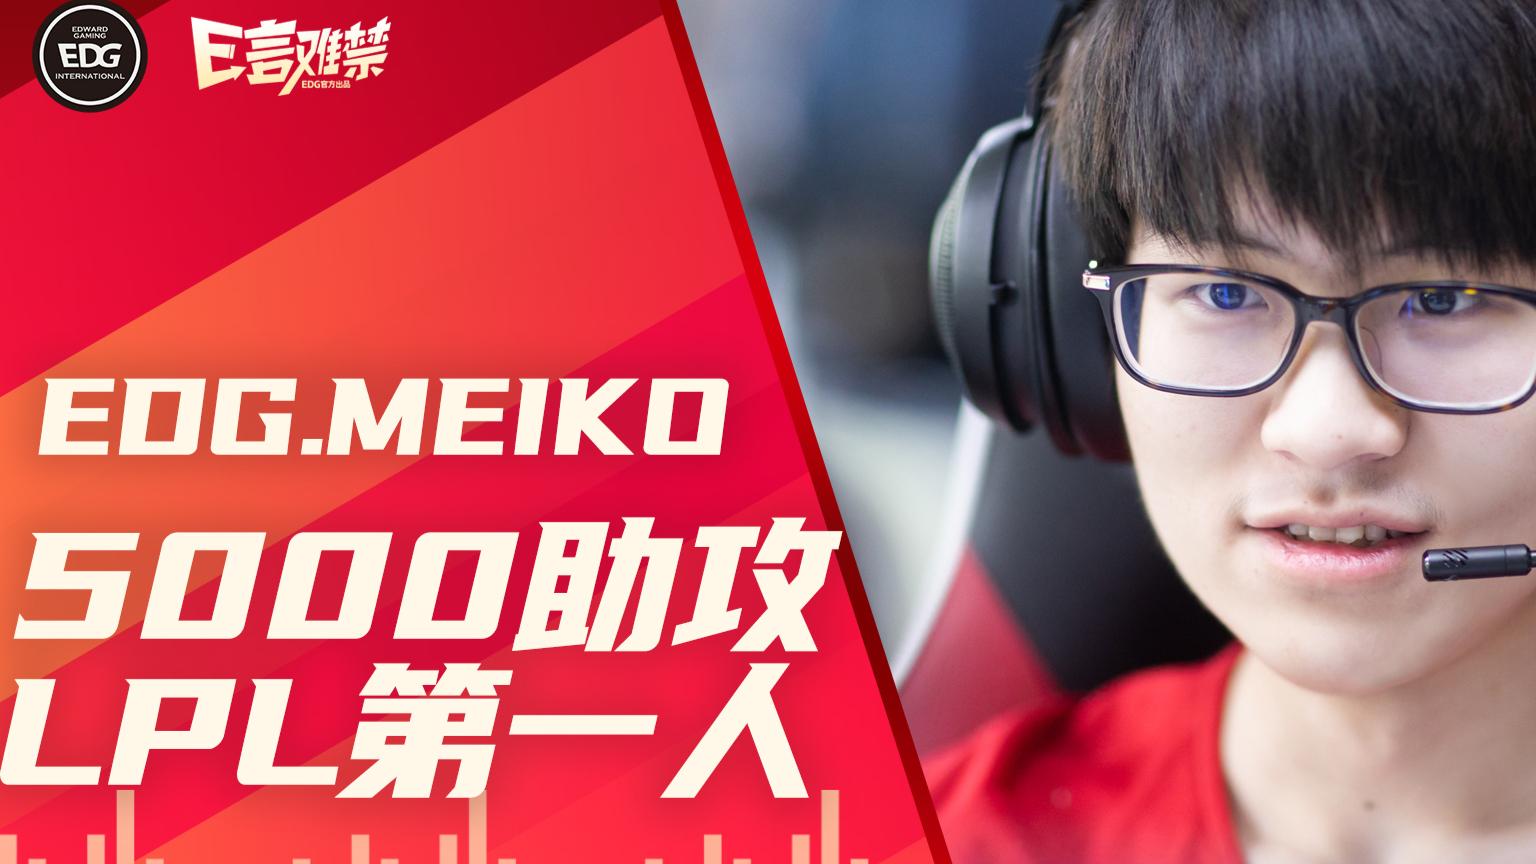 2020EDG《E言难禁》第六期:Meiko5000助攻达成